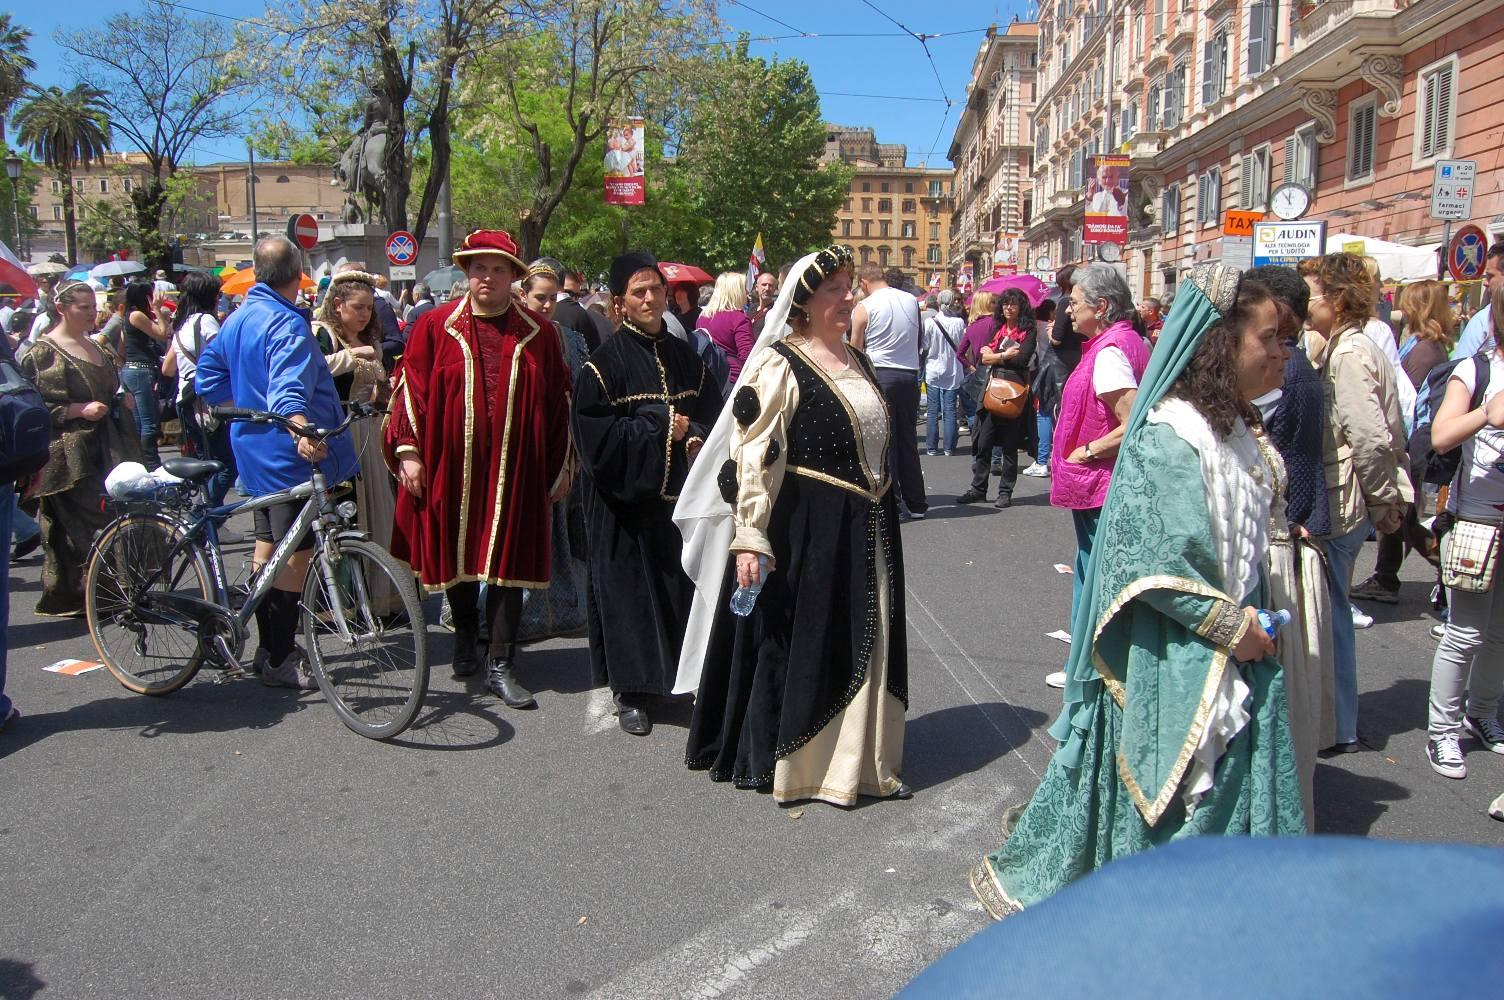 beatificacion_JPII_01_05_2011_069